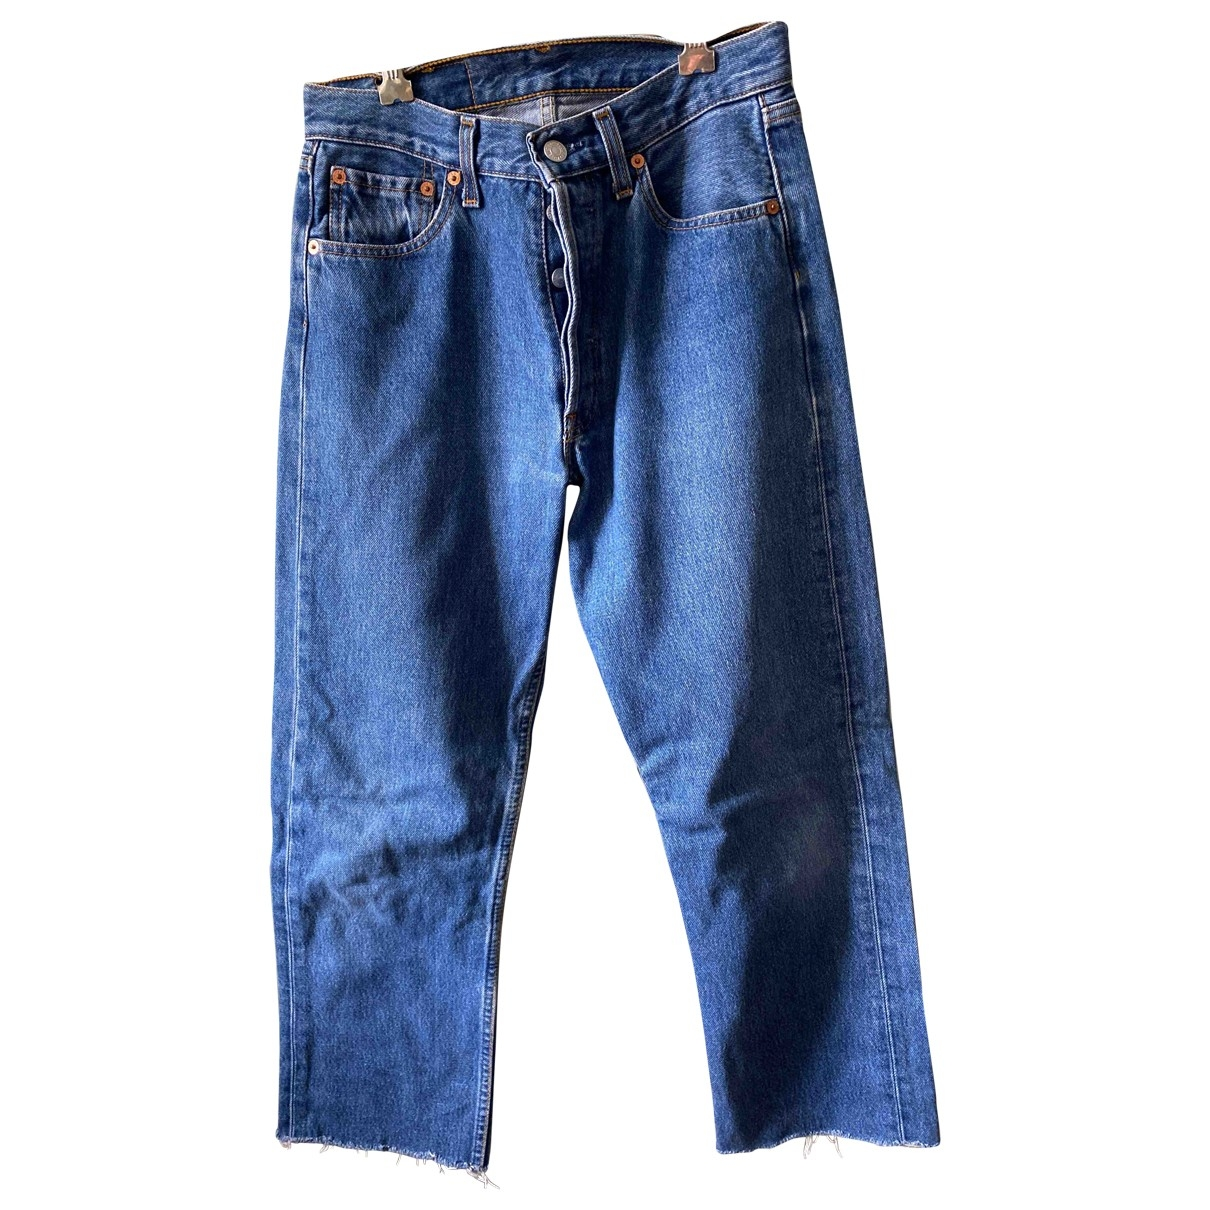 Levi's Vintage Clothing \N Blue Denim - Jeans Jeans for Women 29 US